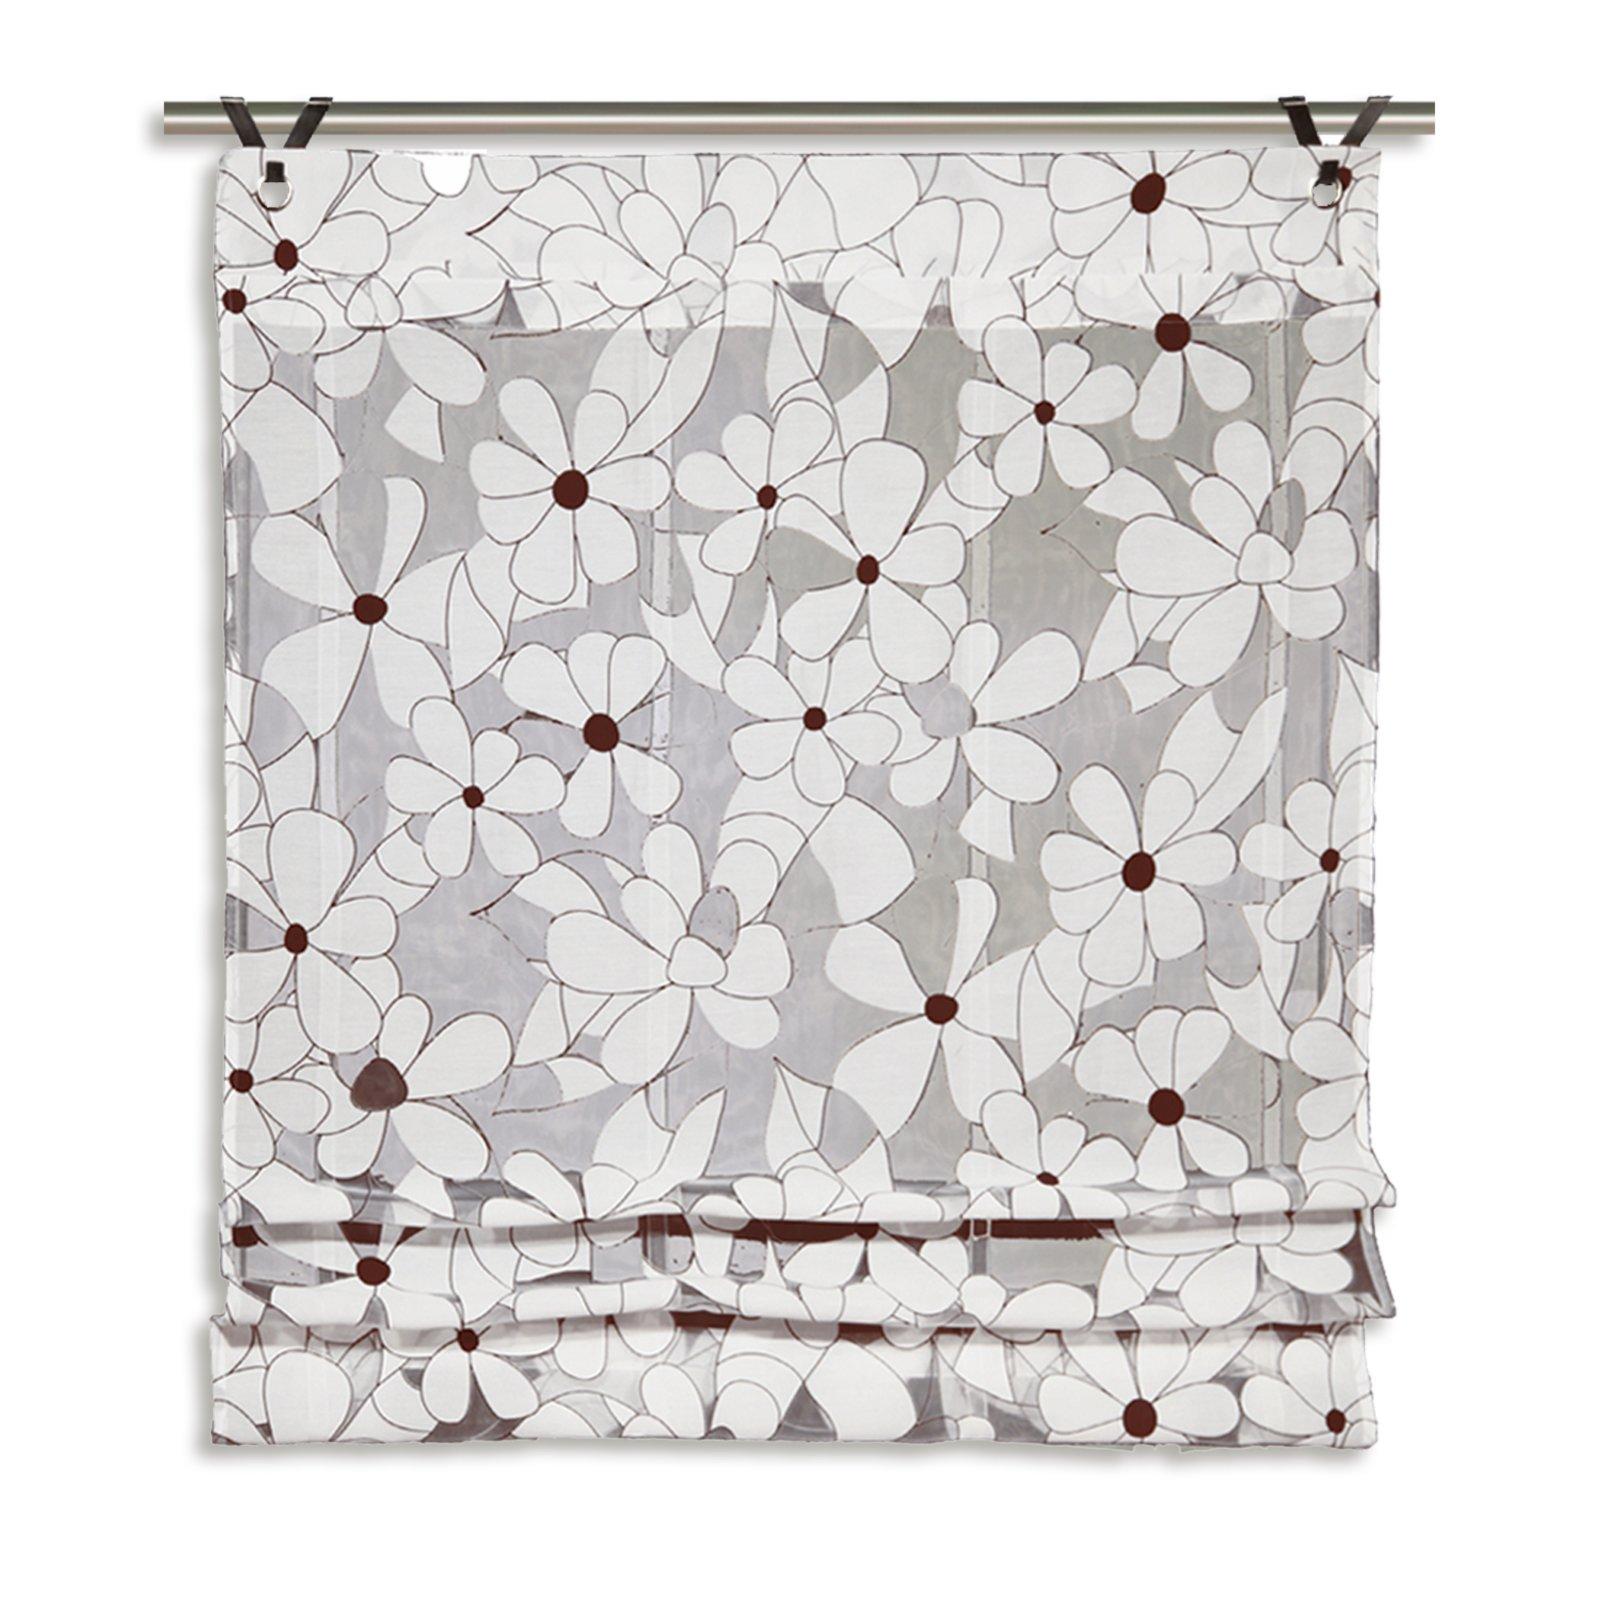 clips rollo benny grau braun 100x140 cm transparente. Black Bedroom Furniture Sets. Home Design Ideas